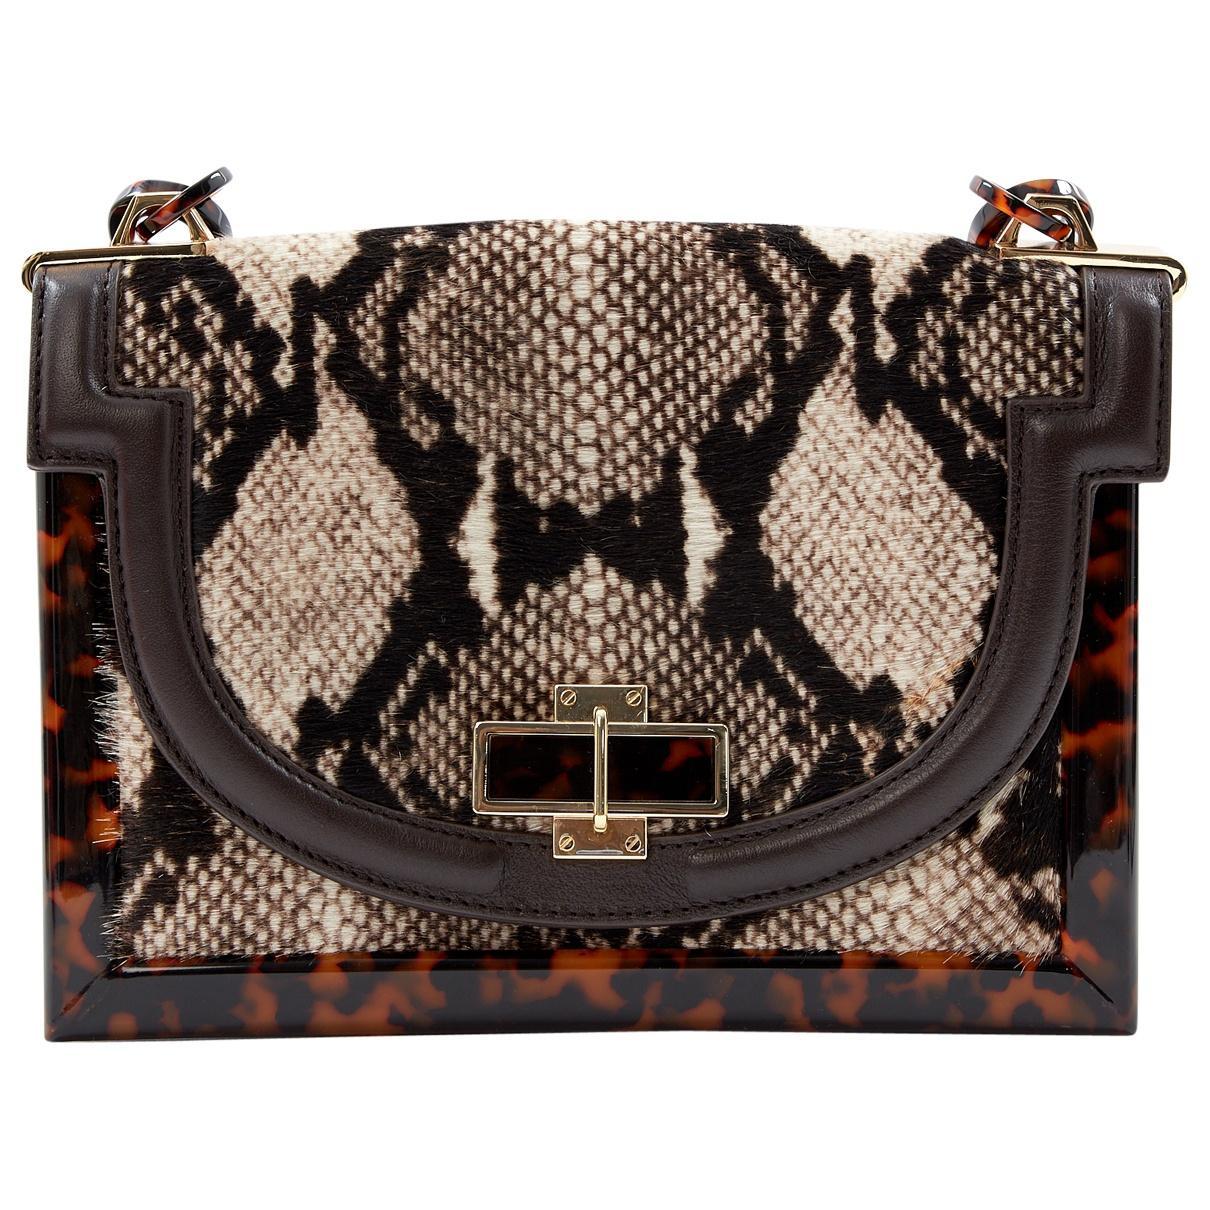 343254c32445 Tory Burch. Women s Multicolour Pony-style Calfskin Handbag